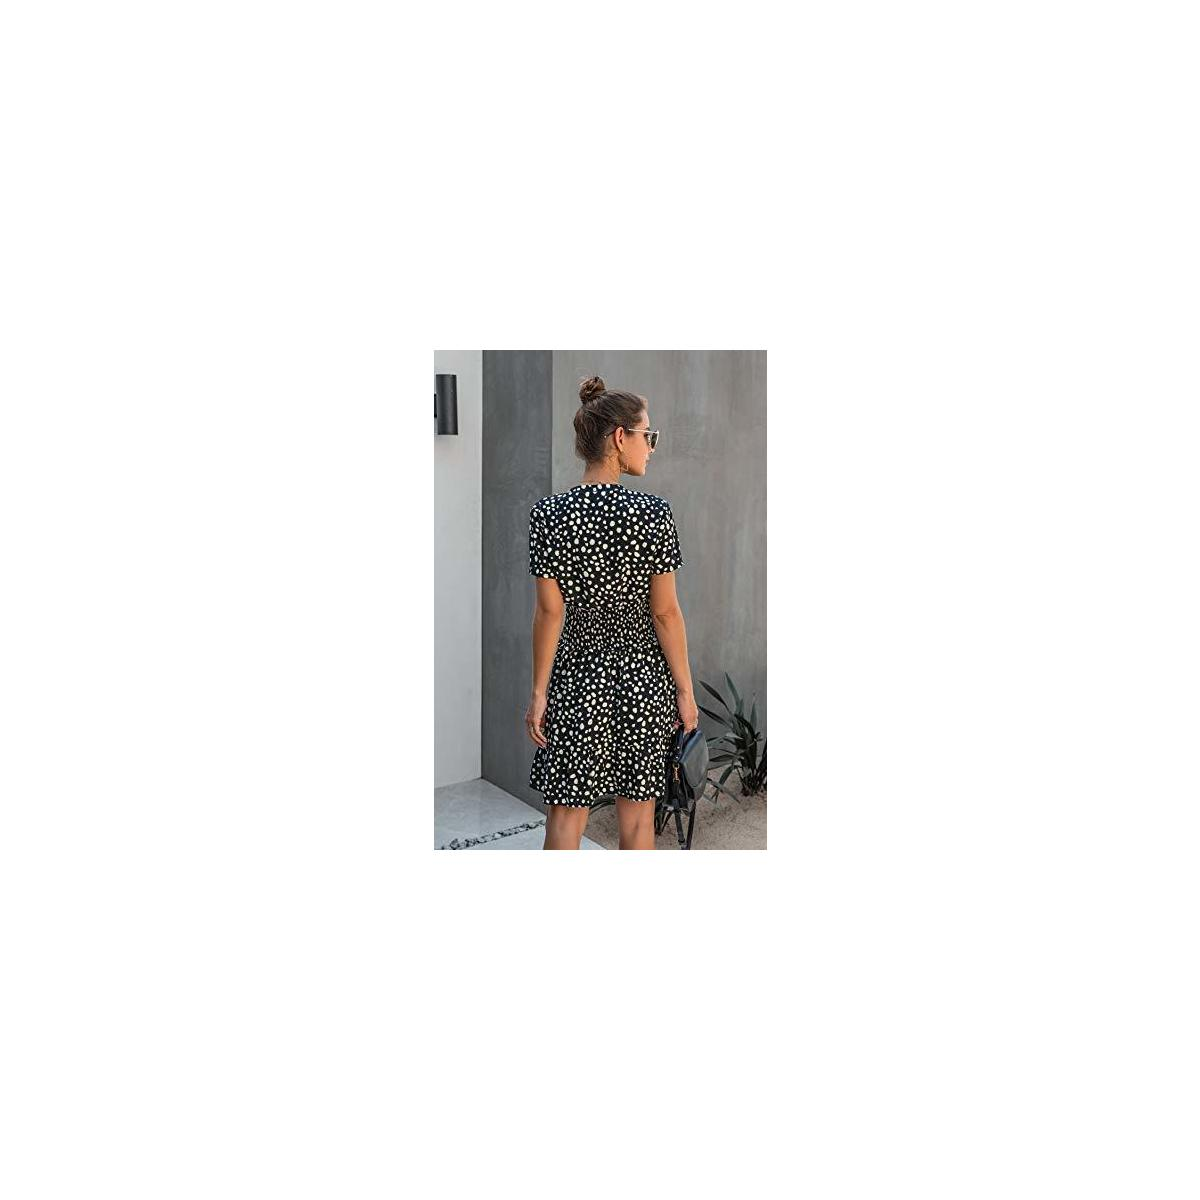 Women's Summer Polka Dot Ruffle Short Sleeve Dress Casual Mini Dress